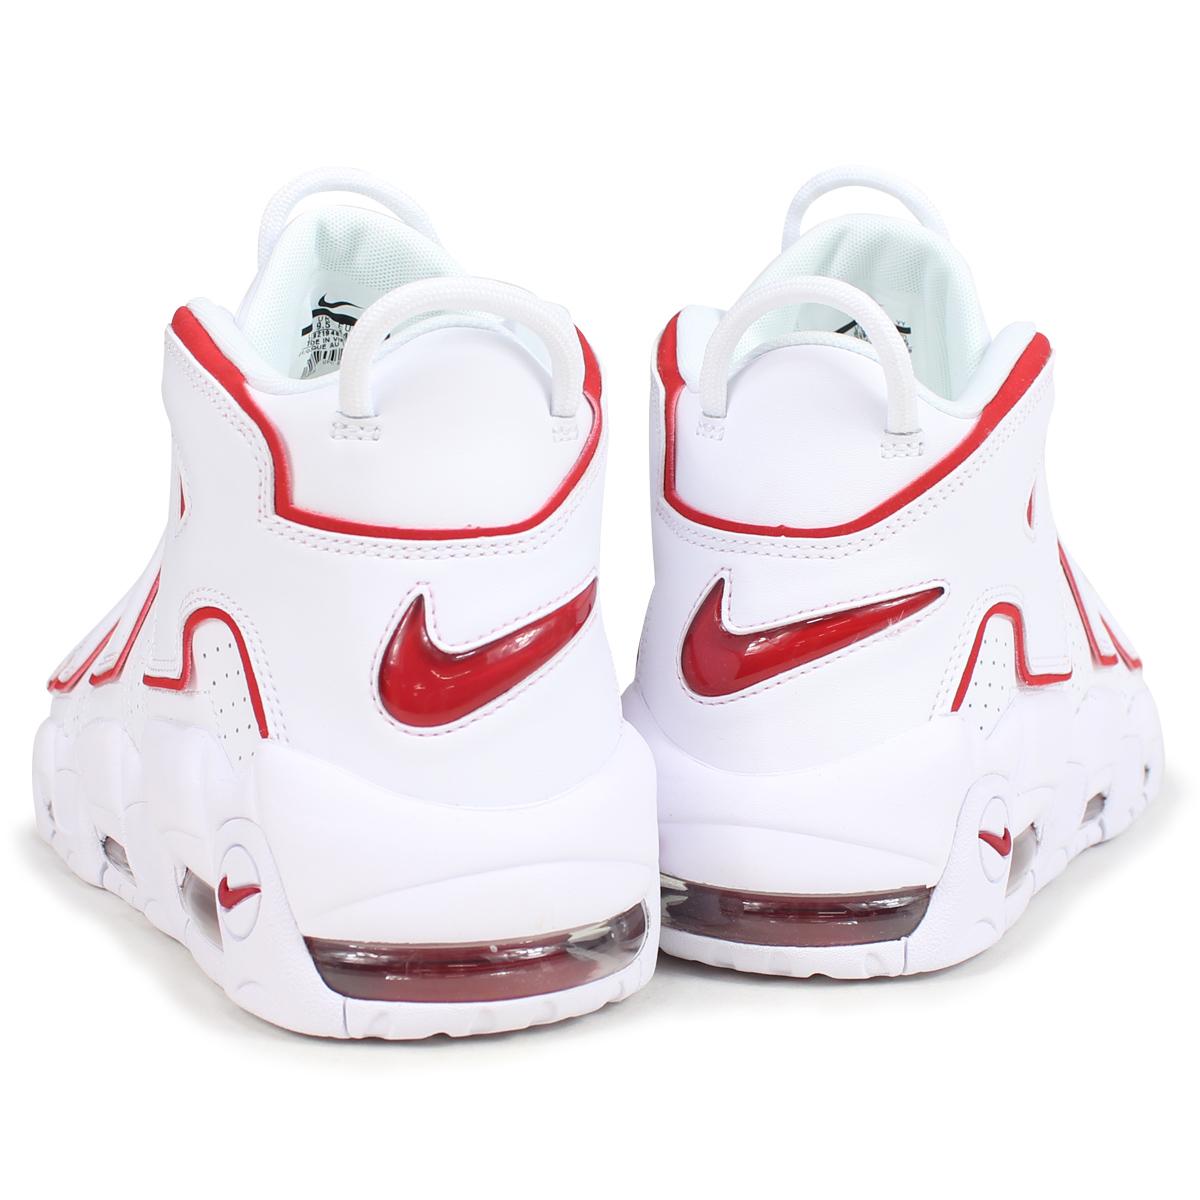 huge discount dbae5 cbfe7 NIKE AIR MORE UPTEMPO 96 Nike air more up tempo sneakers men 921,948-102  white